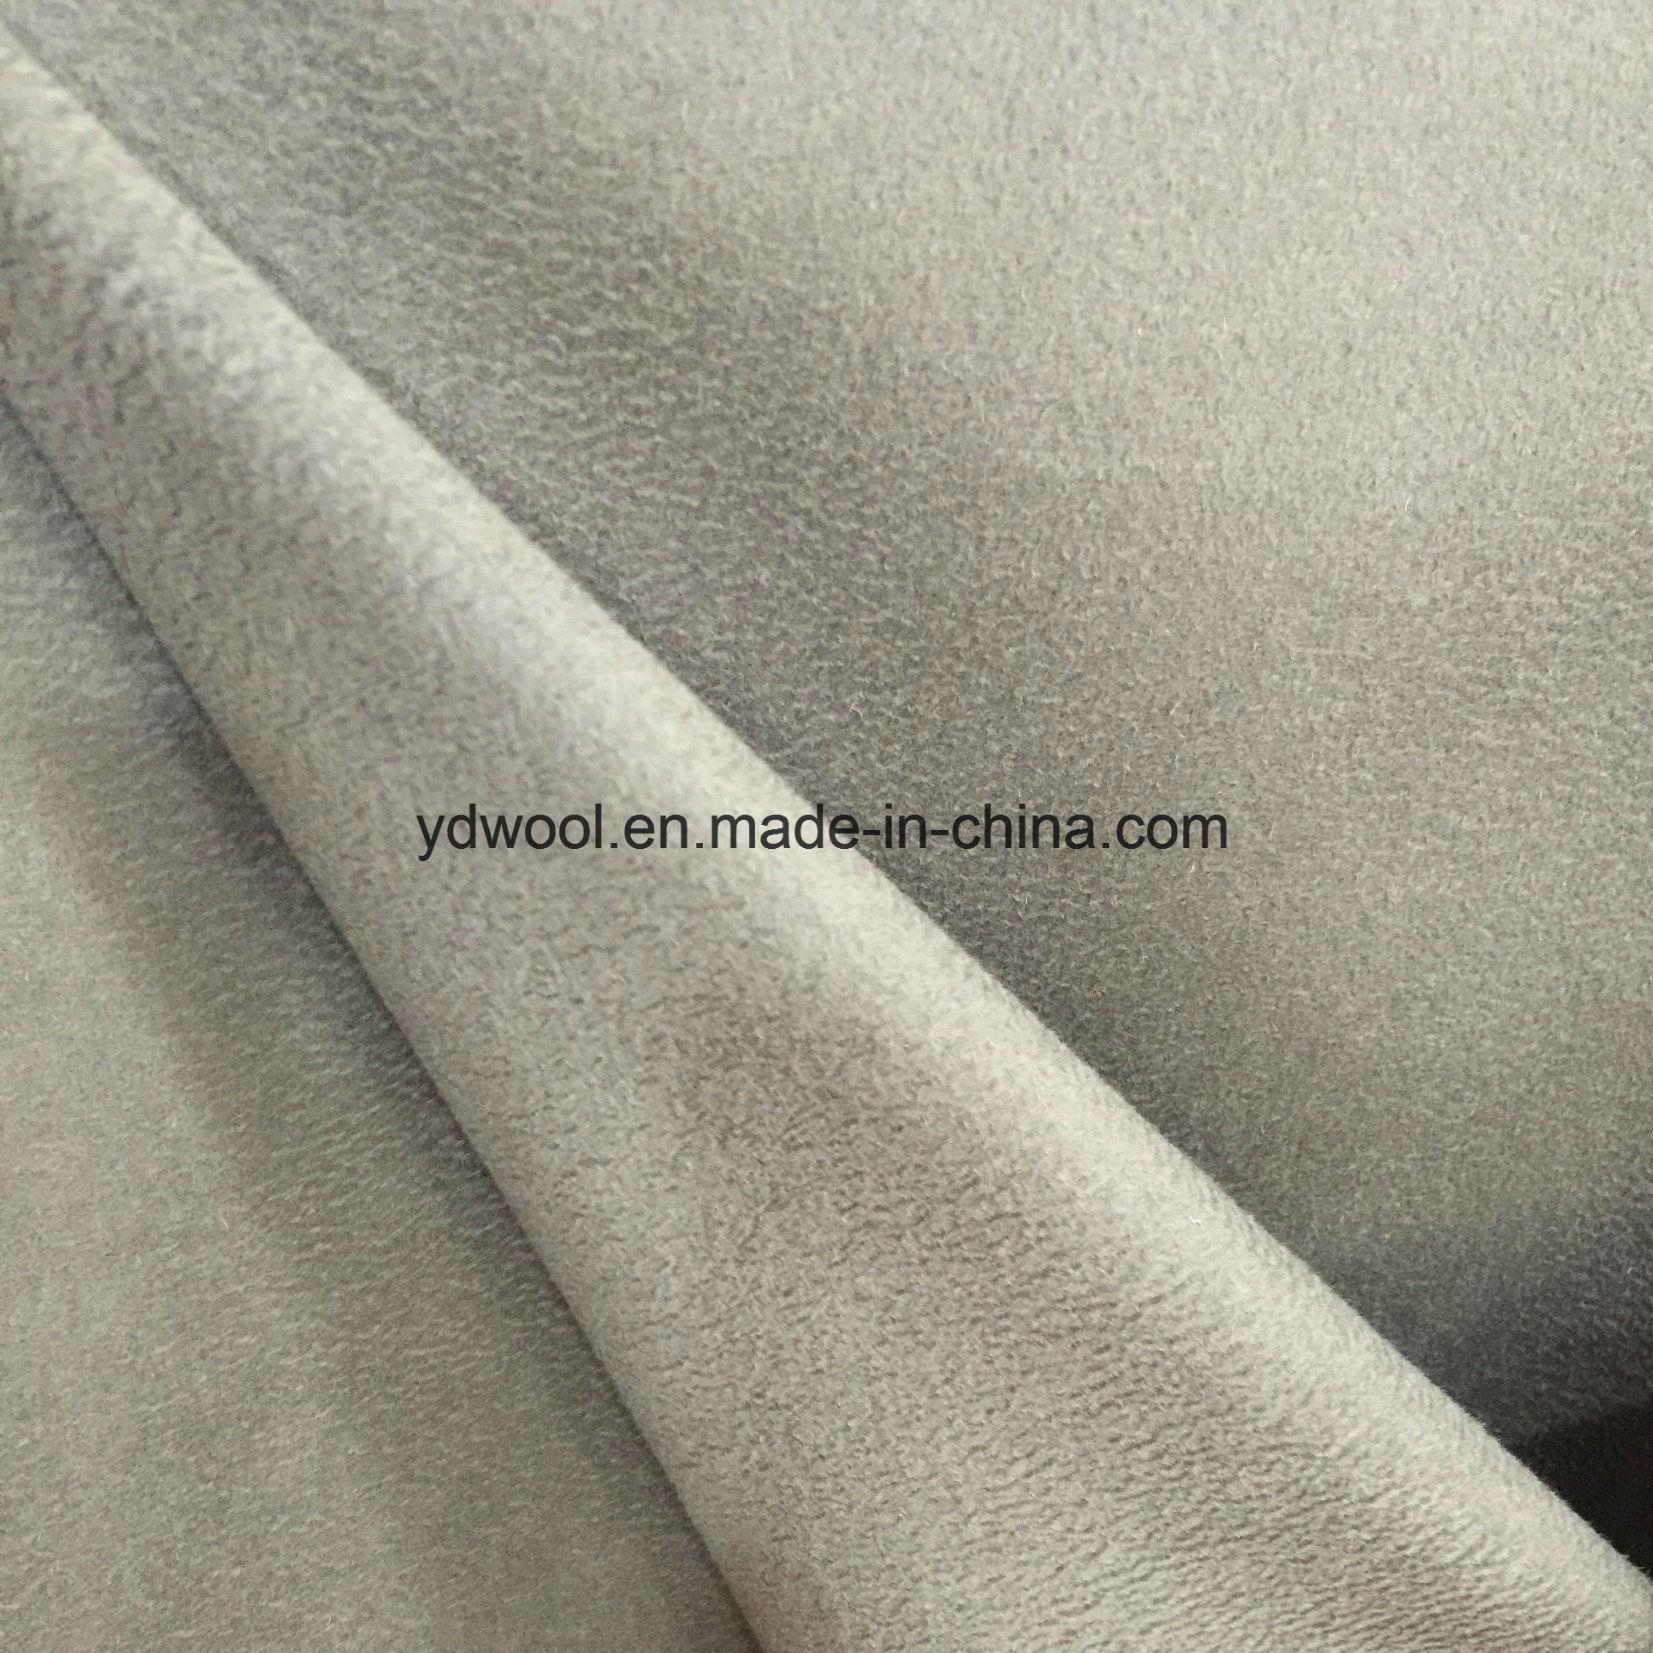 Water Ripple Wool Fabric Ready Greige Fabric